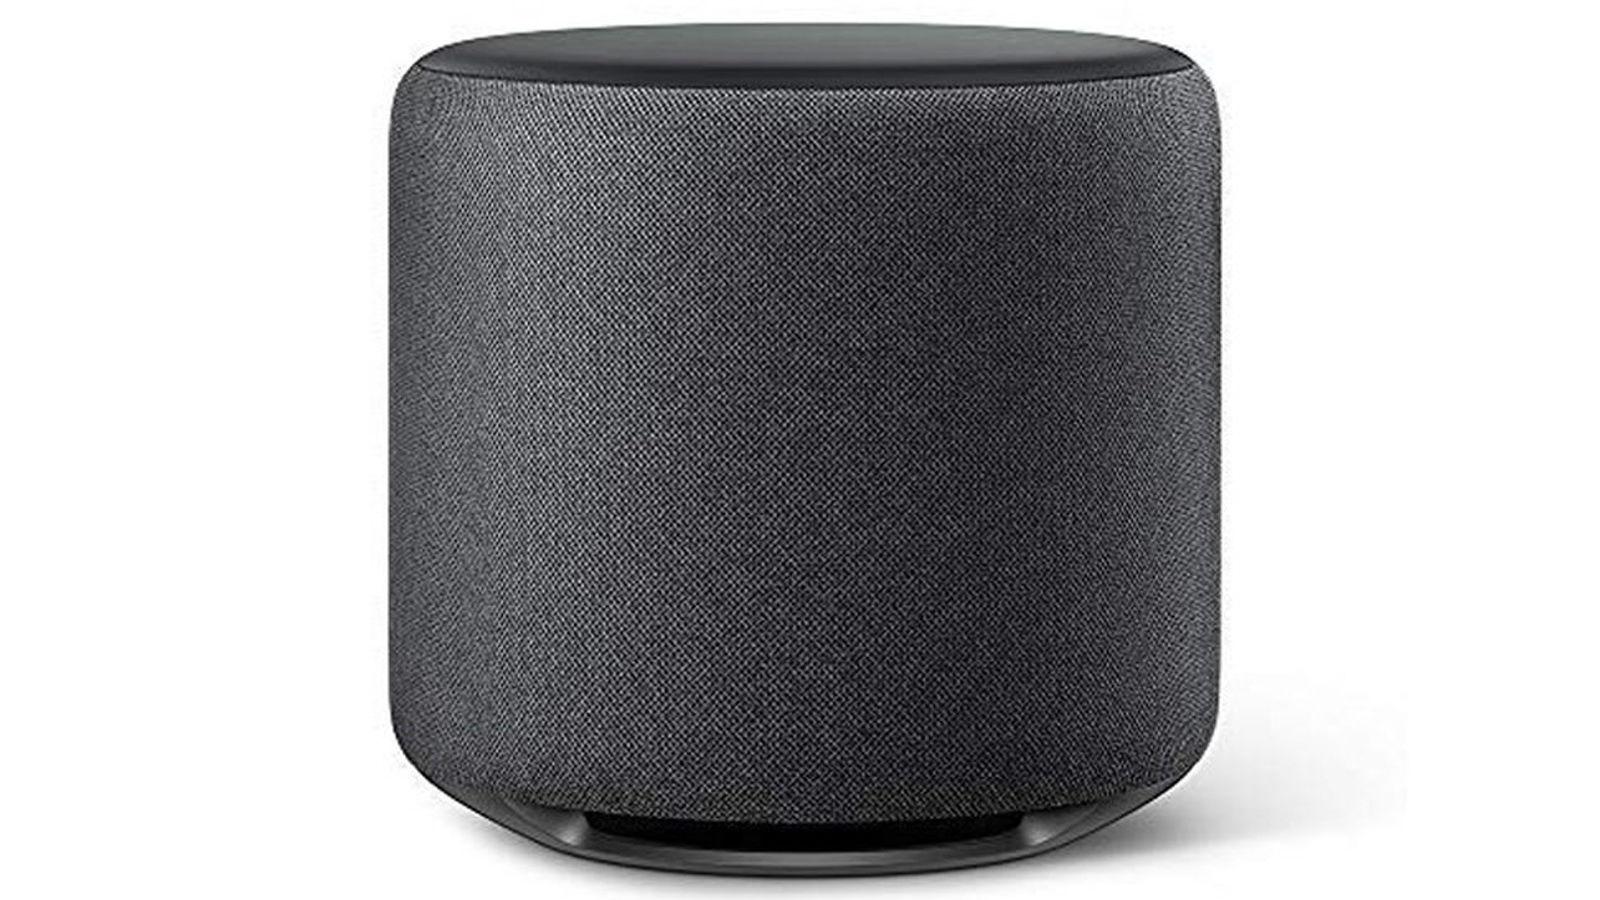 Amazon-lekkasje avslører to nye Alexa-produkter.